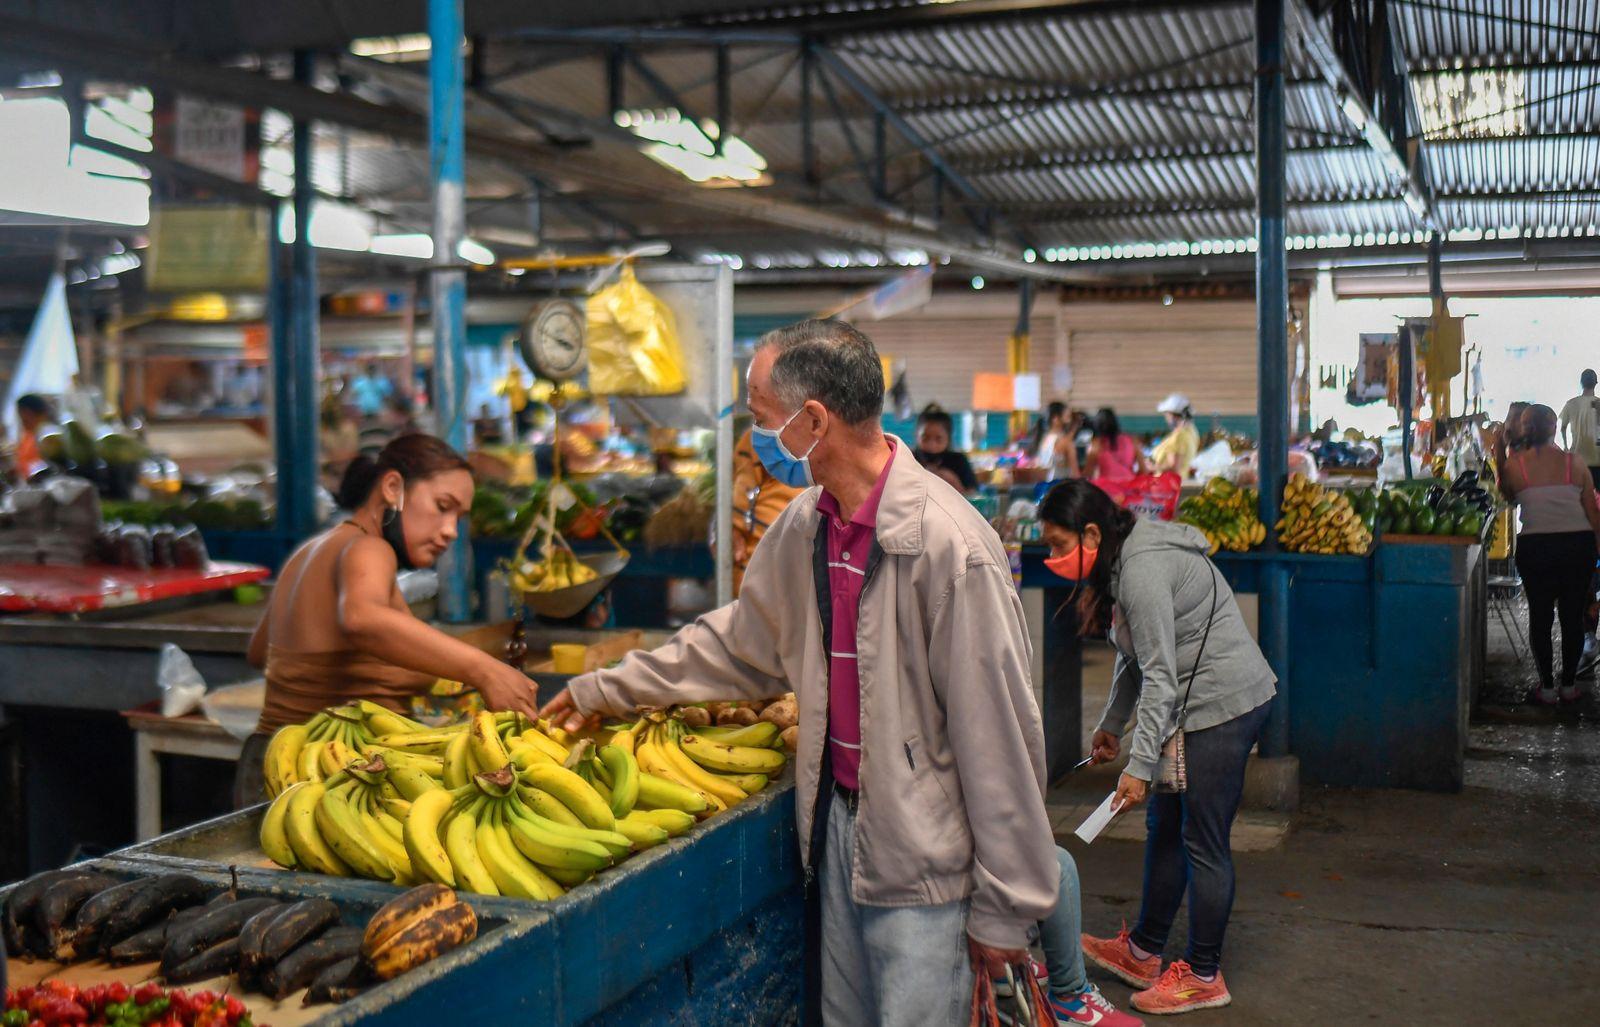 VENEZUELA-CRISIS-ECONOMY-INFLATION-HEALTH-VIRUS